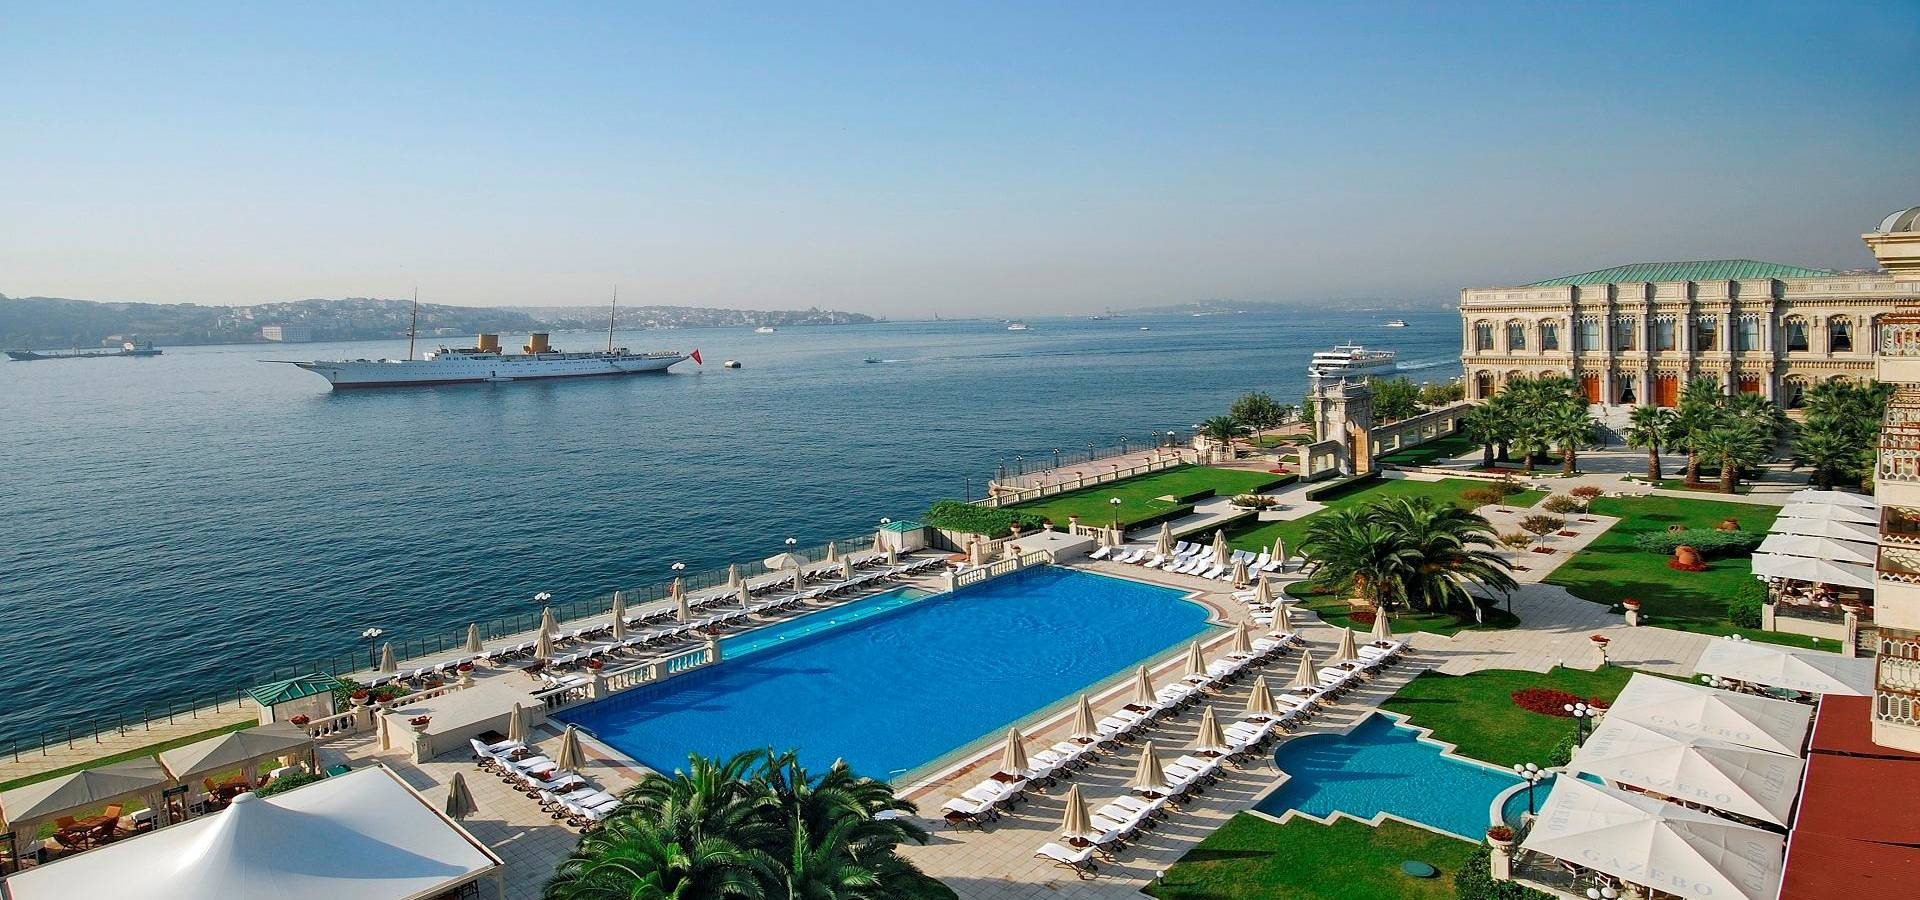 Turquia - Hotel Kempinski Ciragan Palace Istanbul